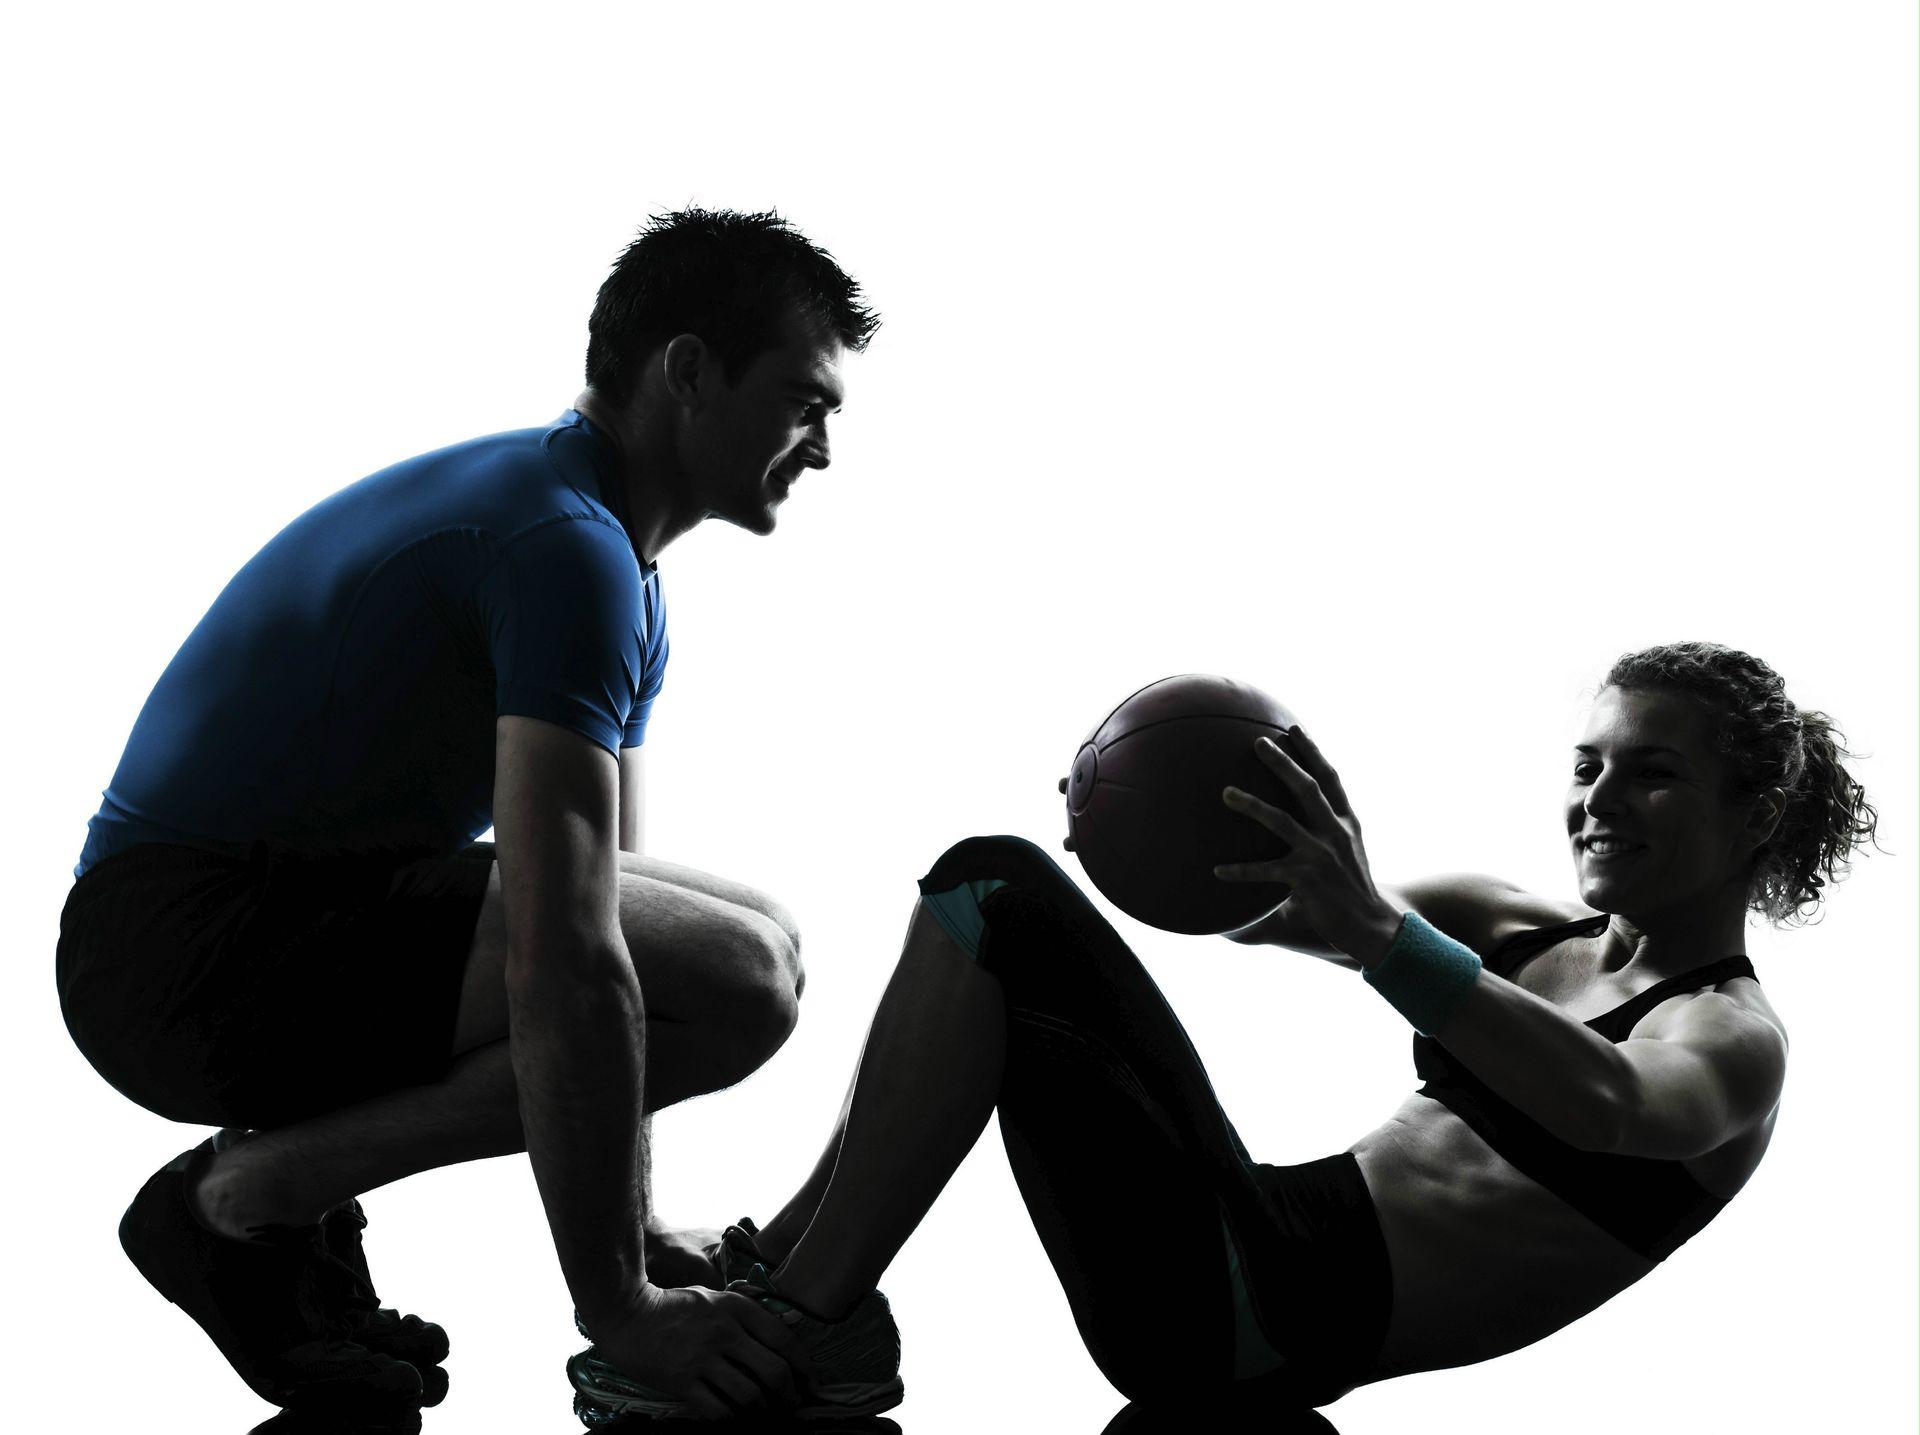 personal-training-istock-fitness